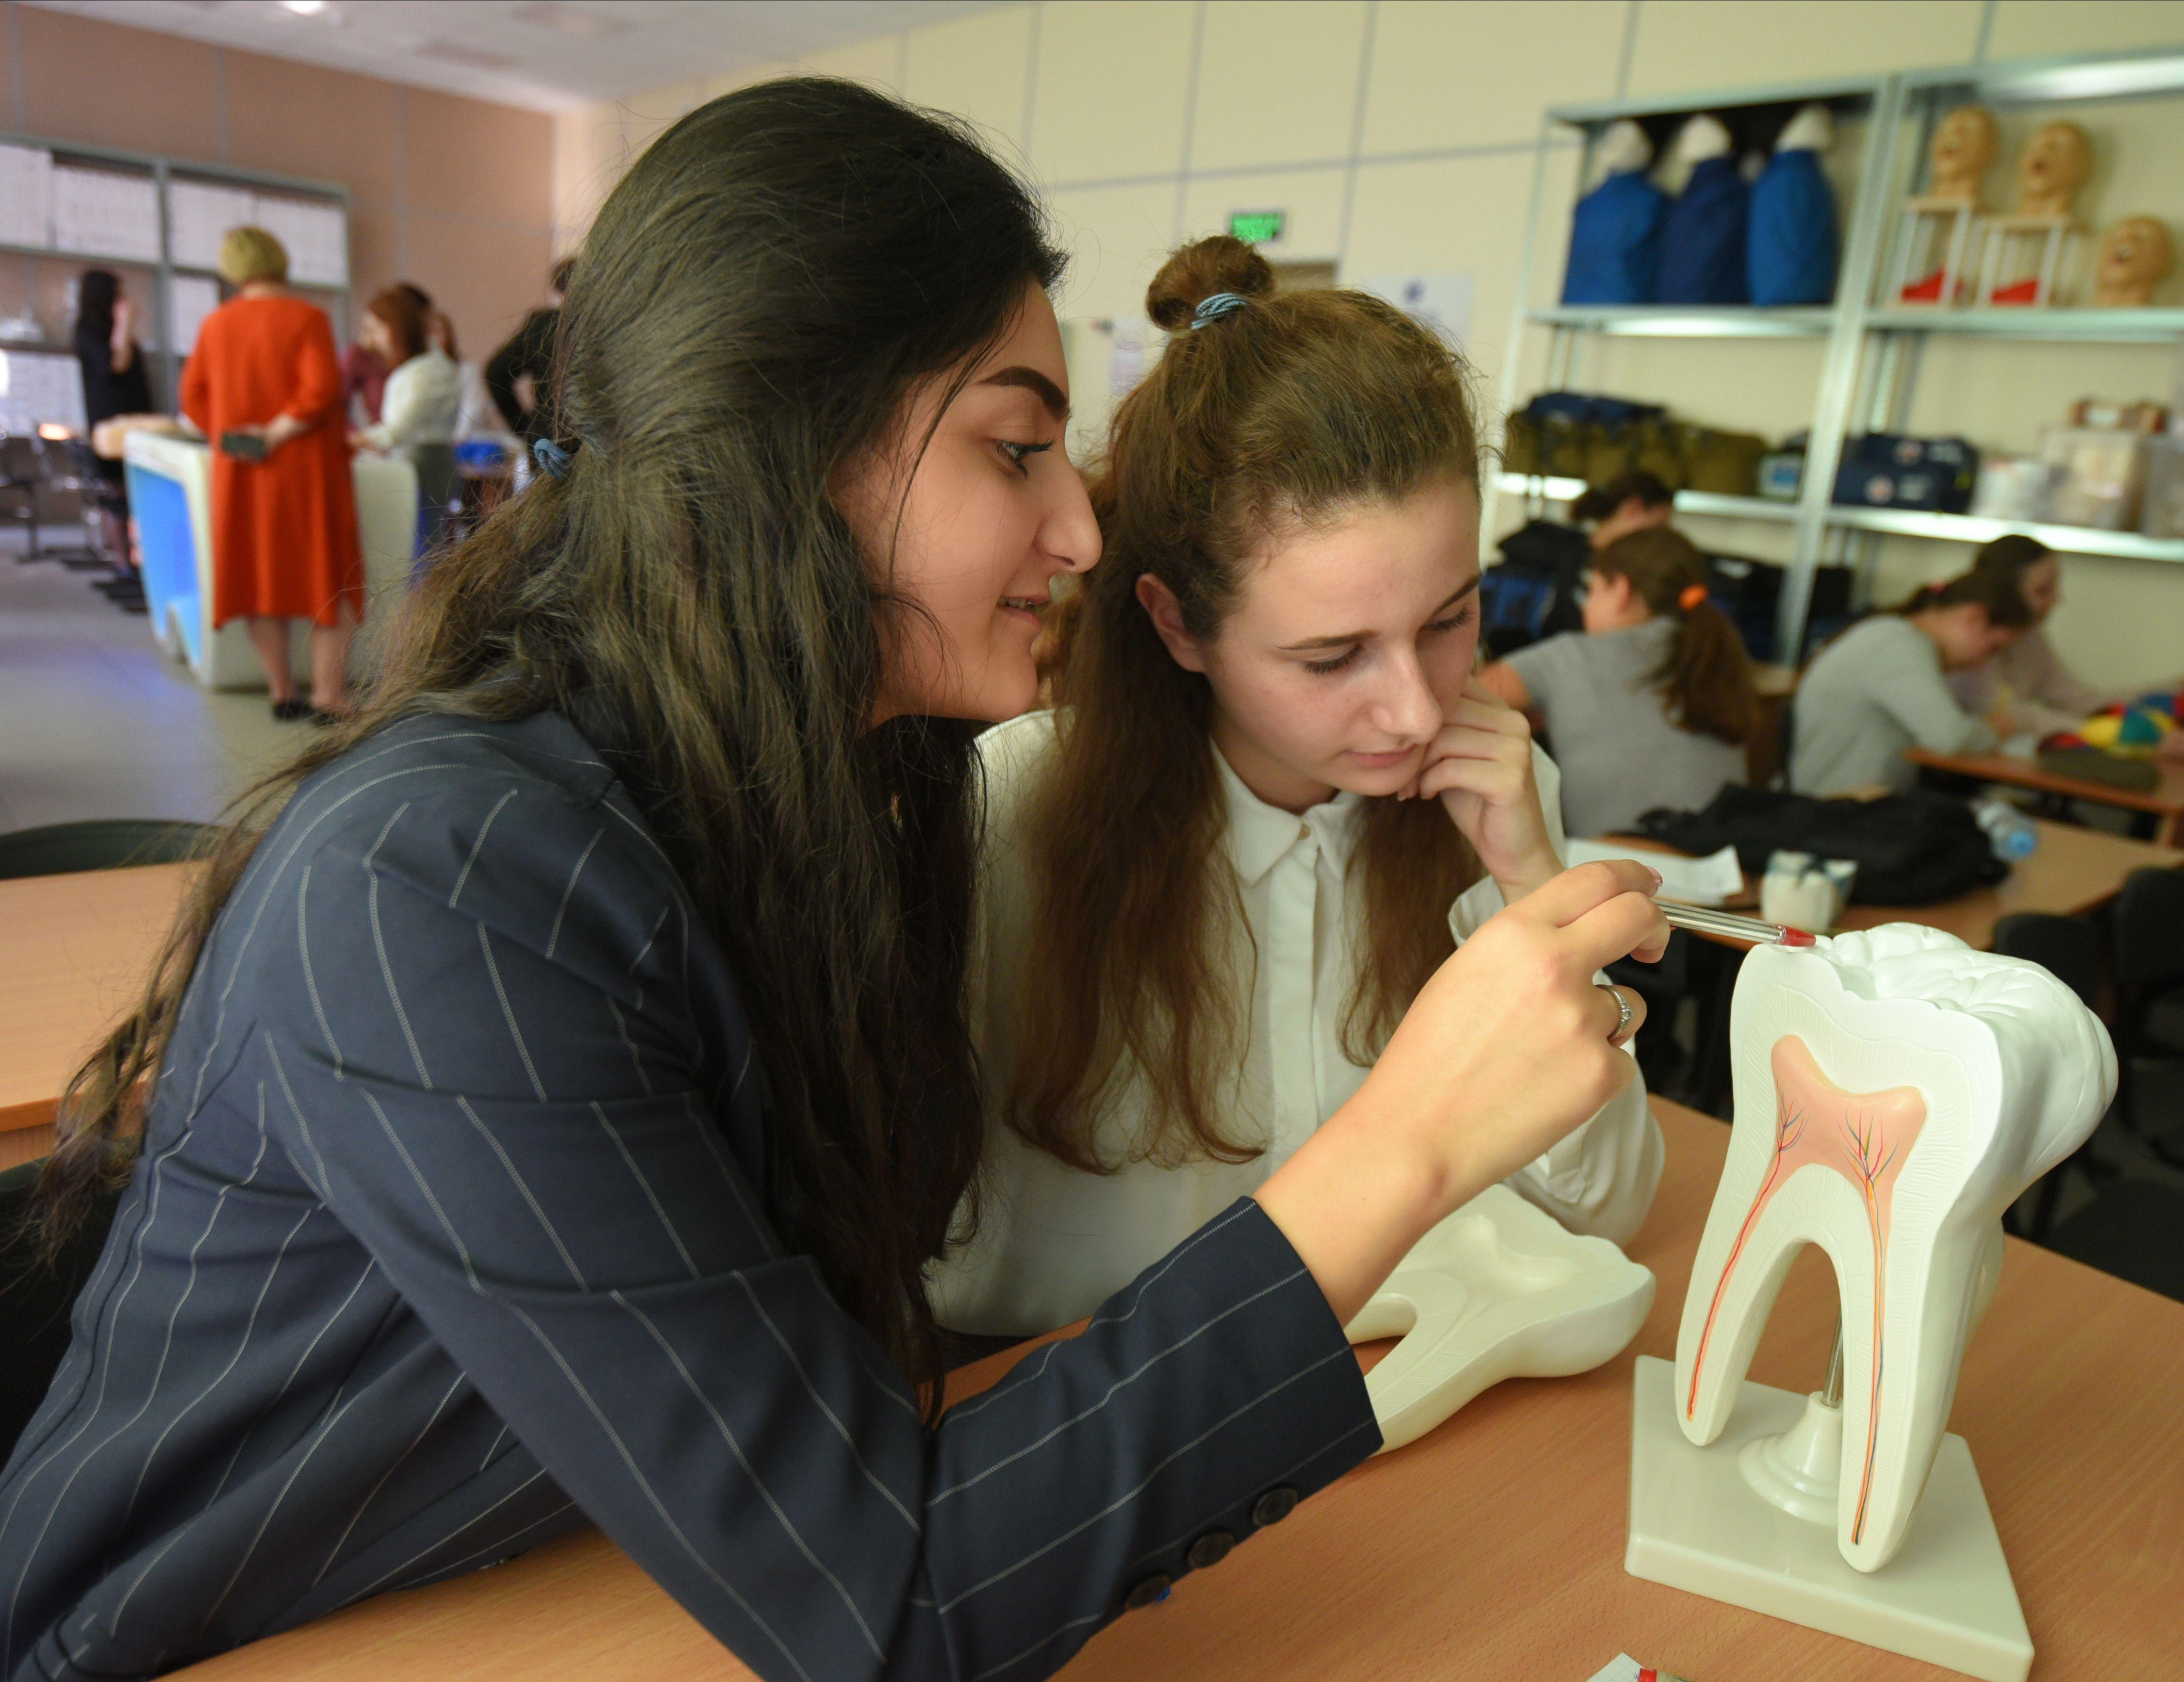 Москвичам рассказали о пользе проекта «Школа старшеклассников»